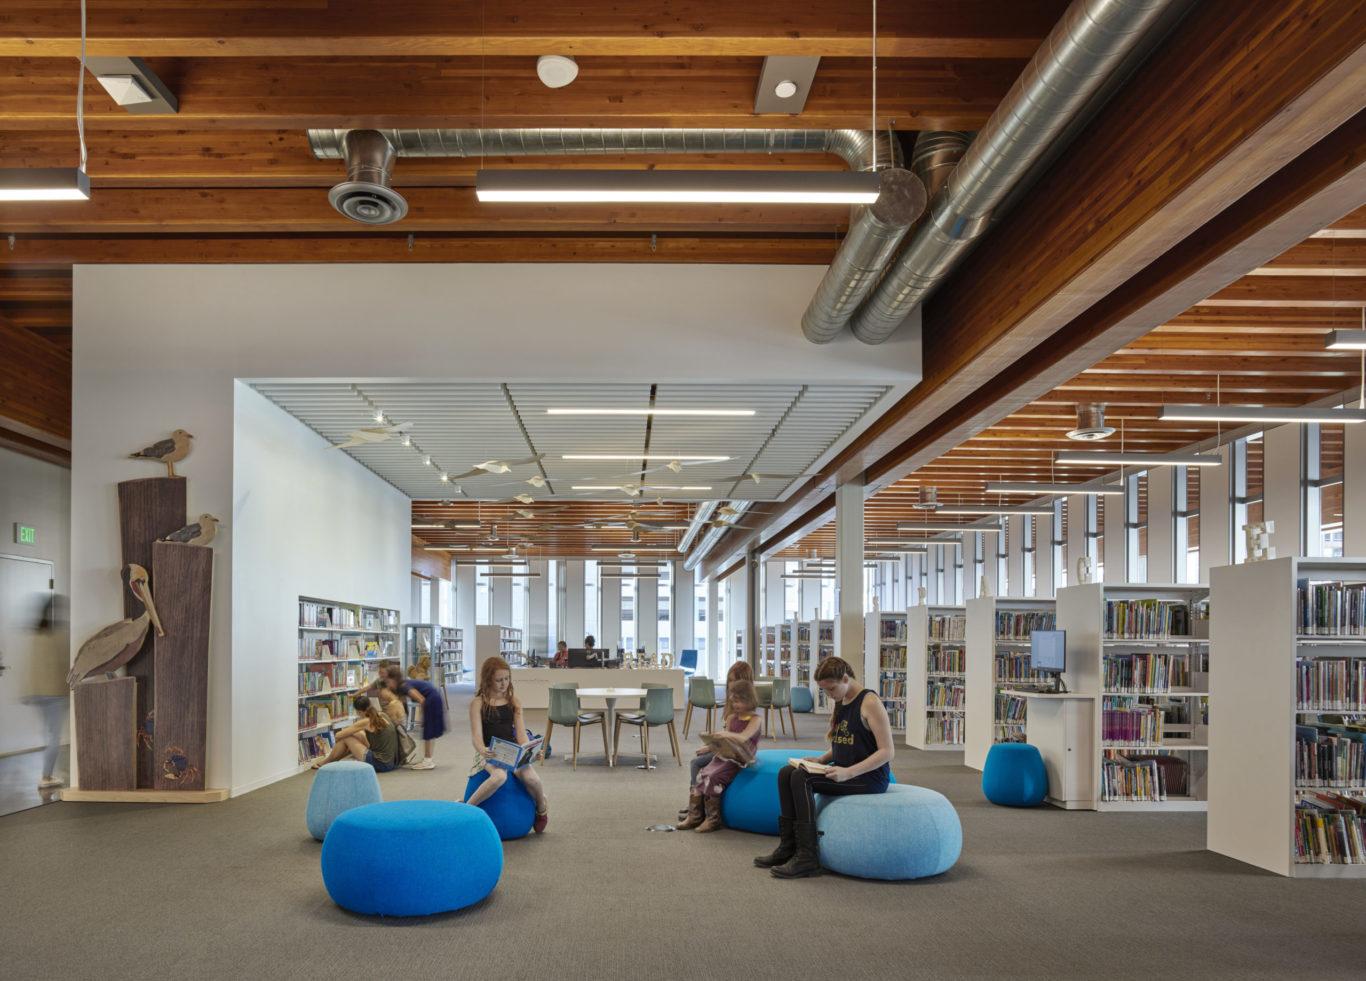 Slide 3 of 15, Billie Jean King Main Library